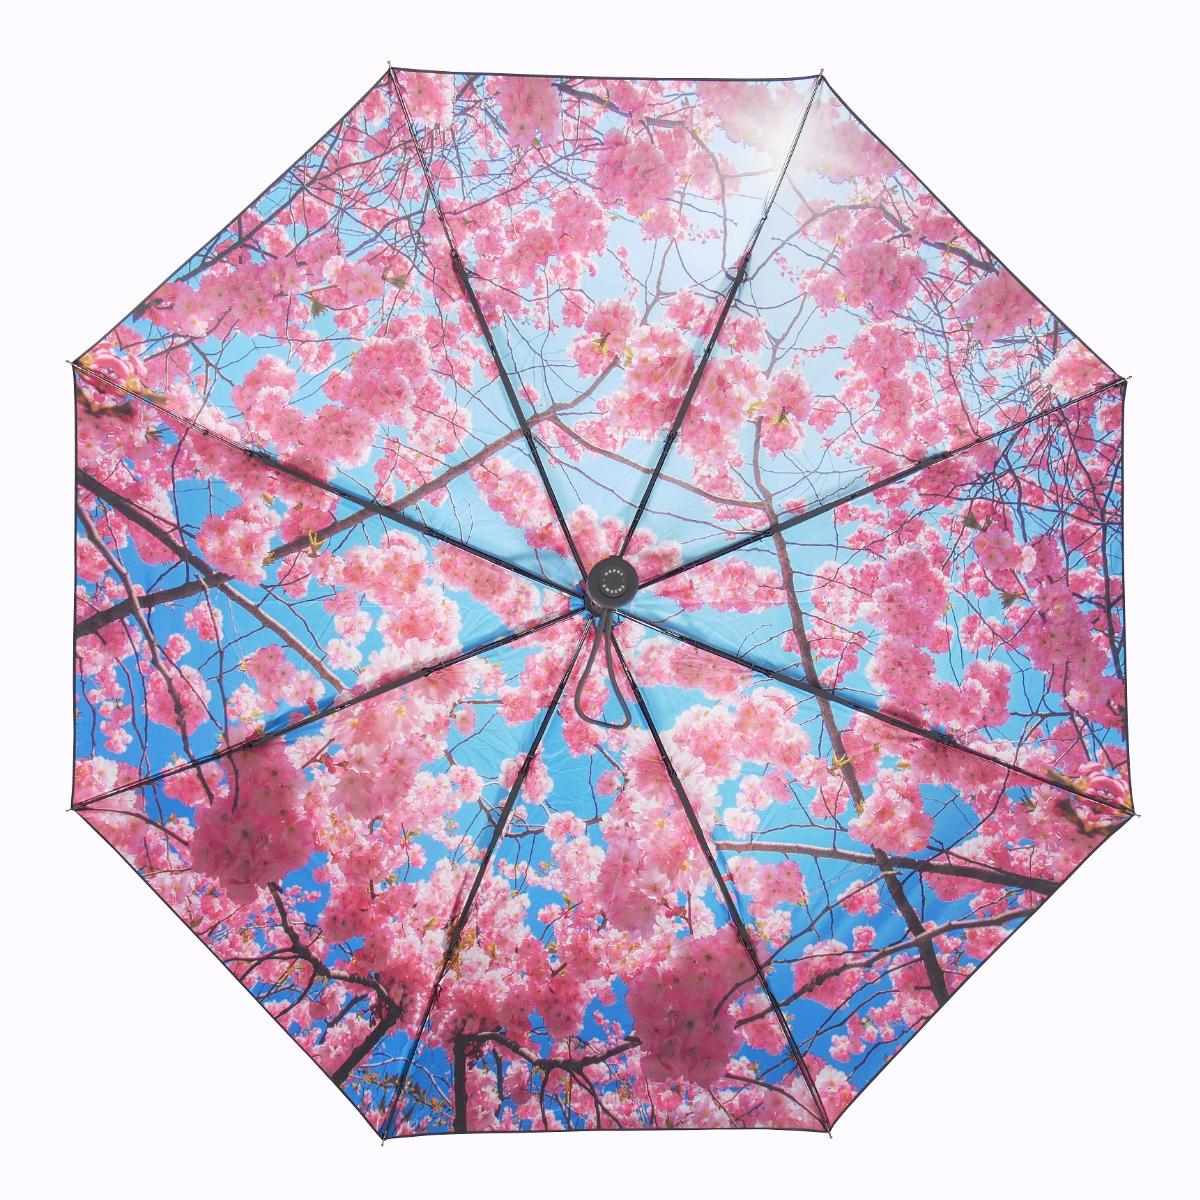 Cherry Regenschirm von HappySweeds (5)